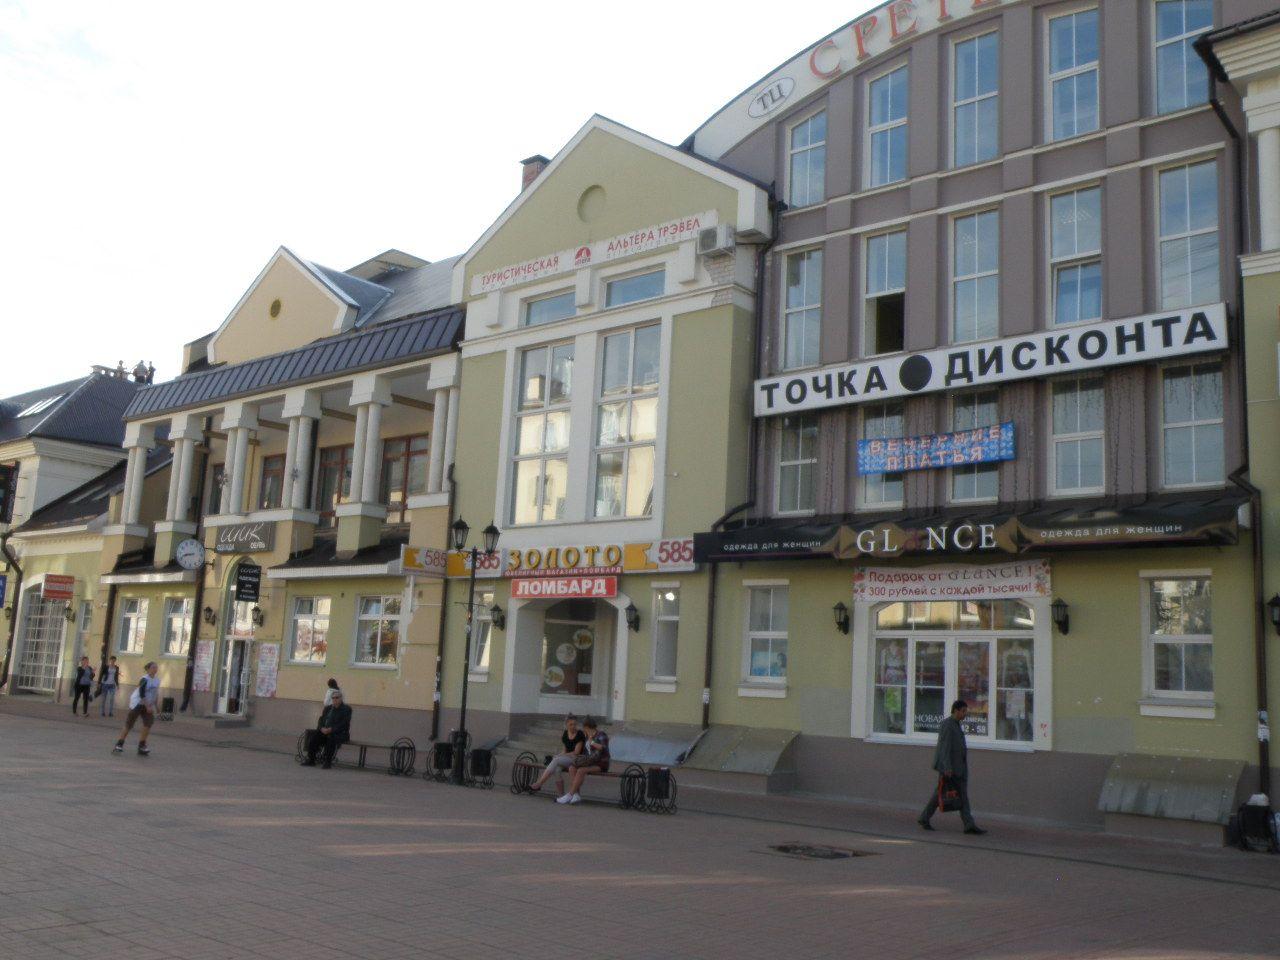 Торговом центре Сретенка